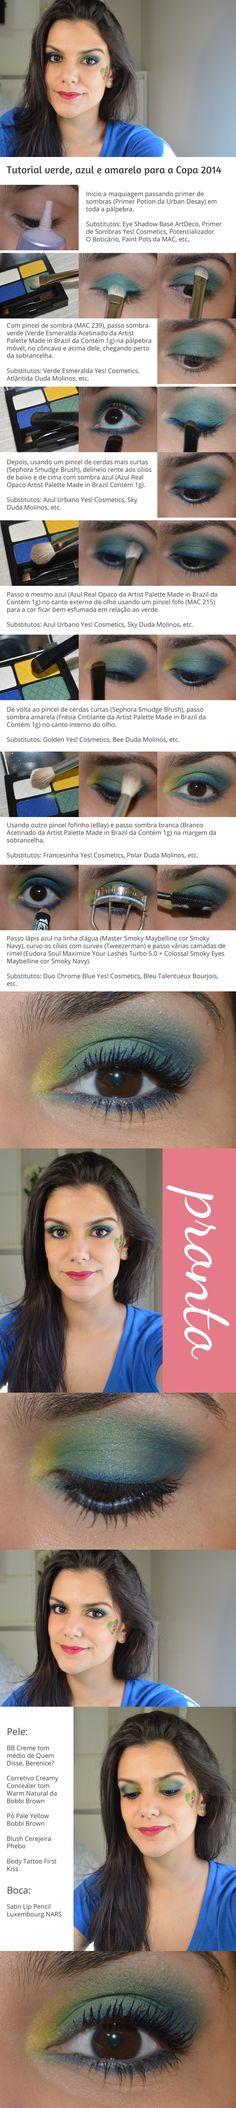 Tutorial: Verde, azul e amarelo para a Copa 2014 http://www.2beauty.com.br/blog/2014/05/30/tutorial-verde-azul-e-amarelo-para-a-copa-2014/ #tutorial #VaiTerCopa